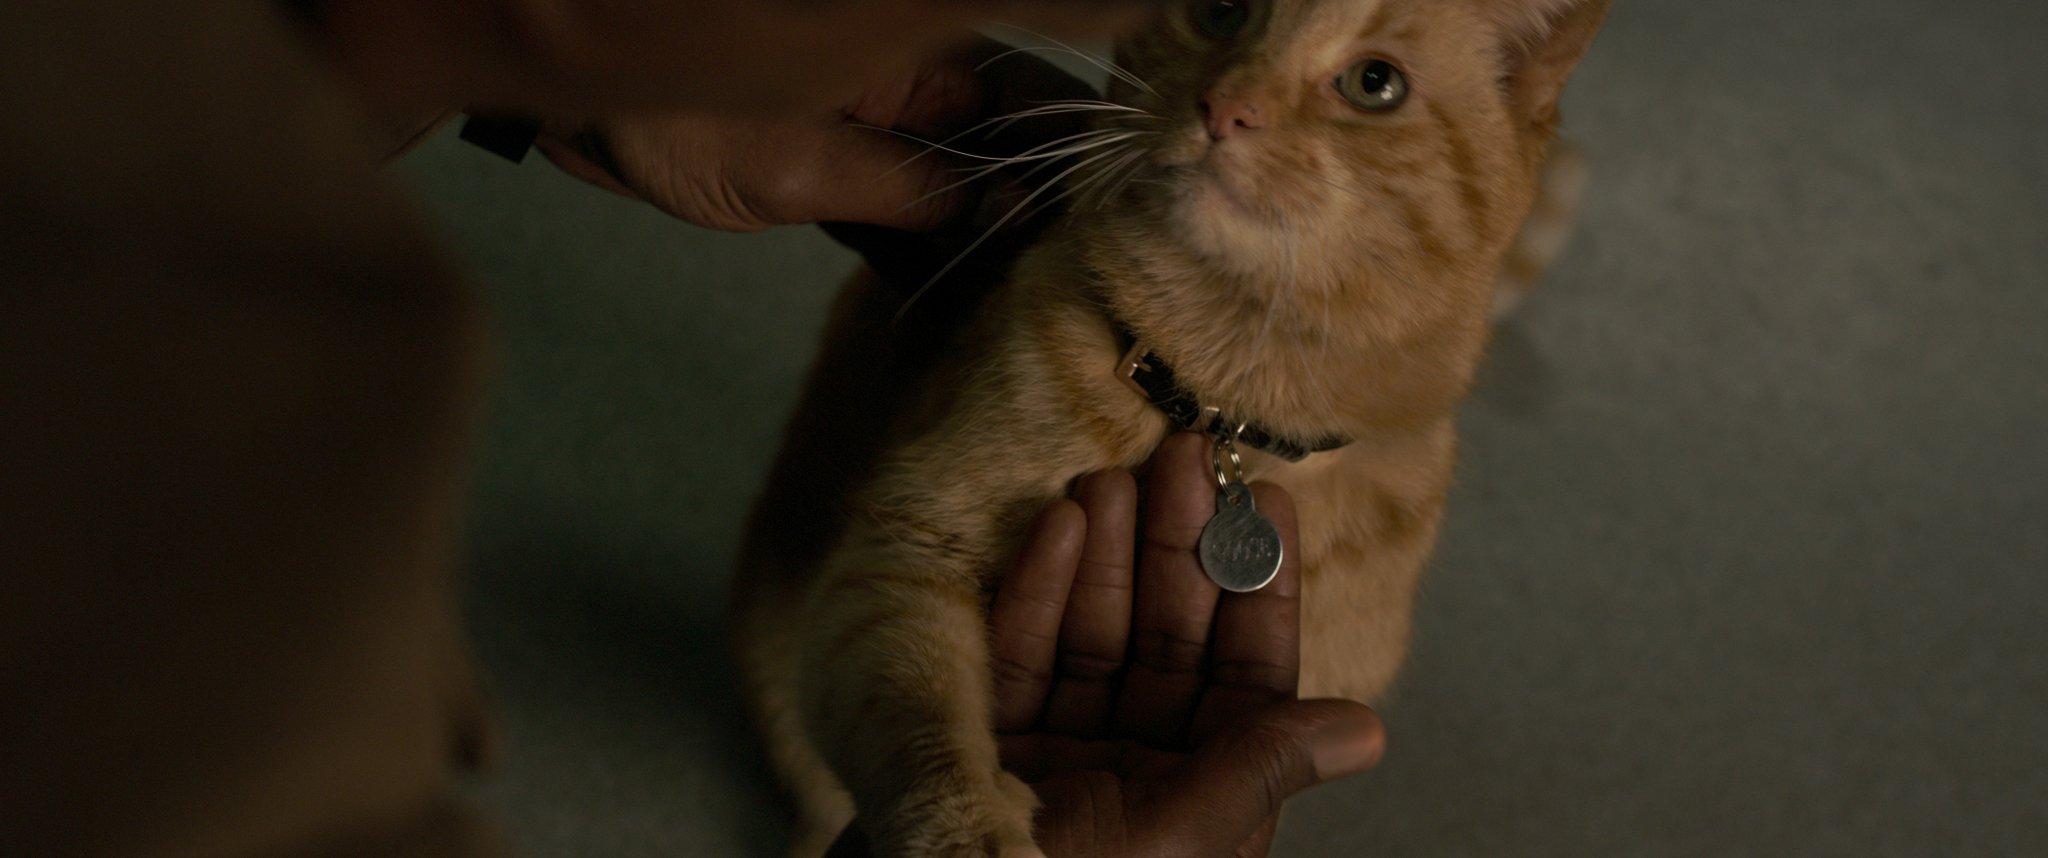 Гус кадр из фильма Капитан Марвел 2019